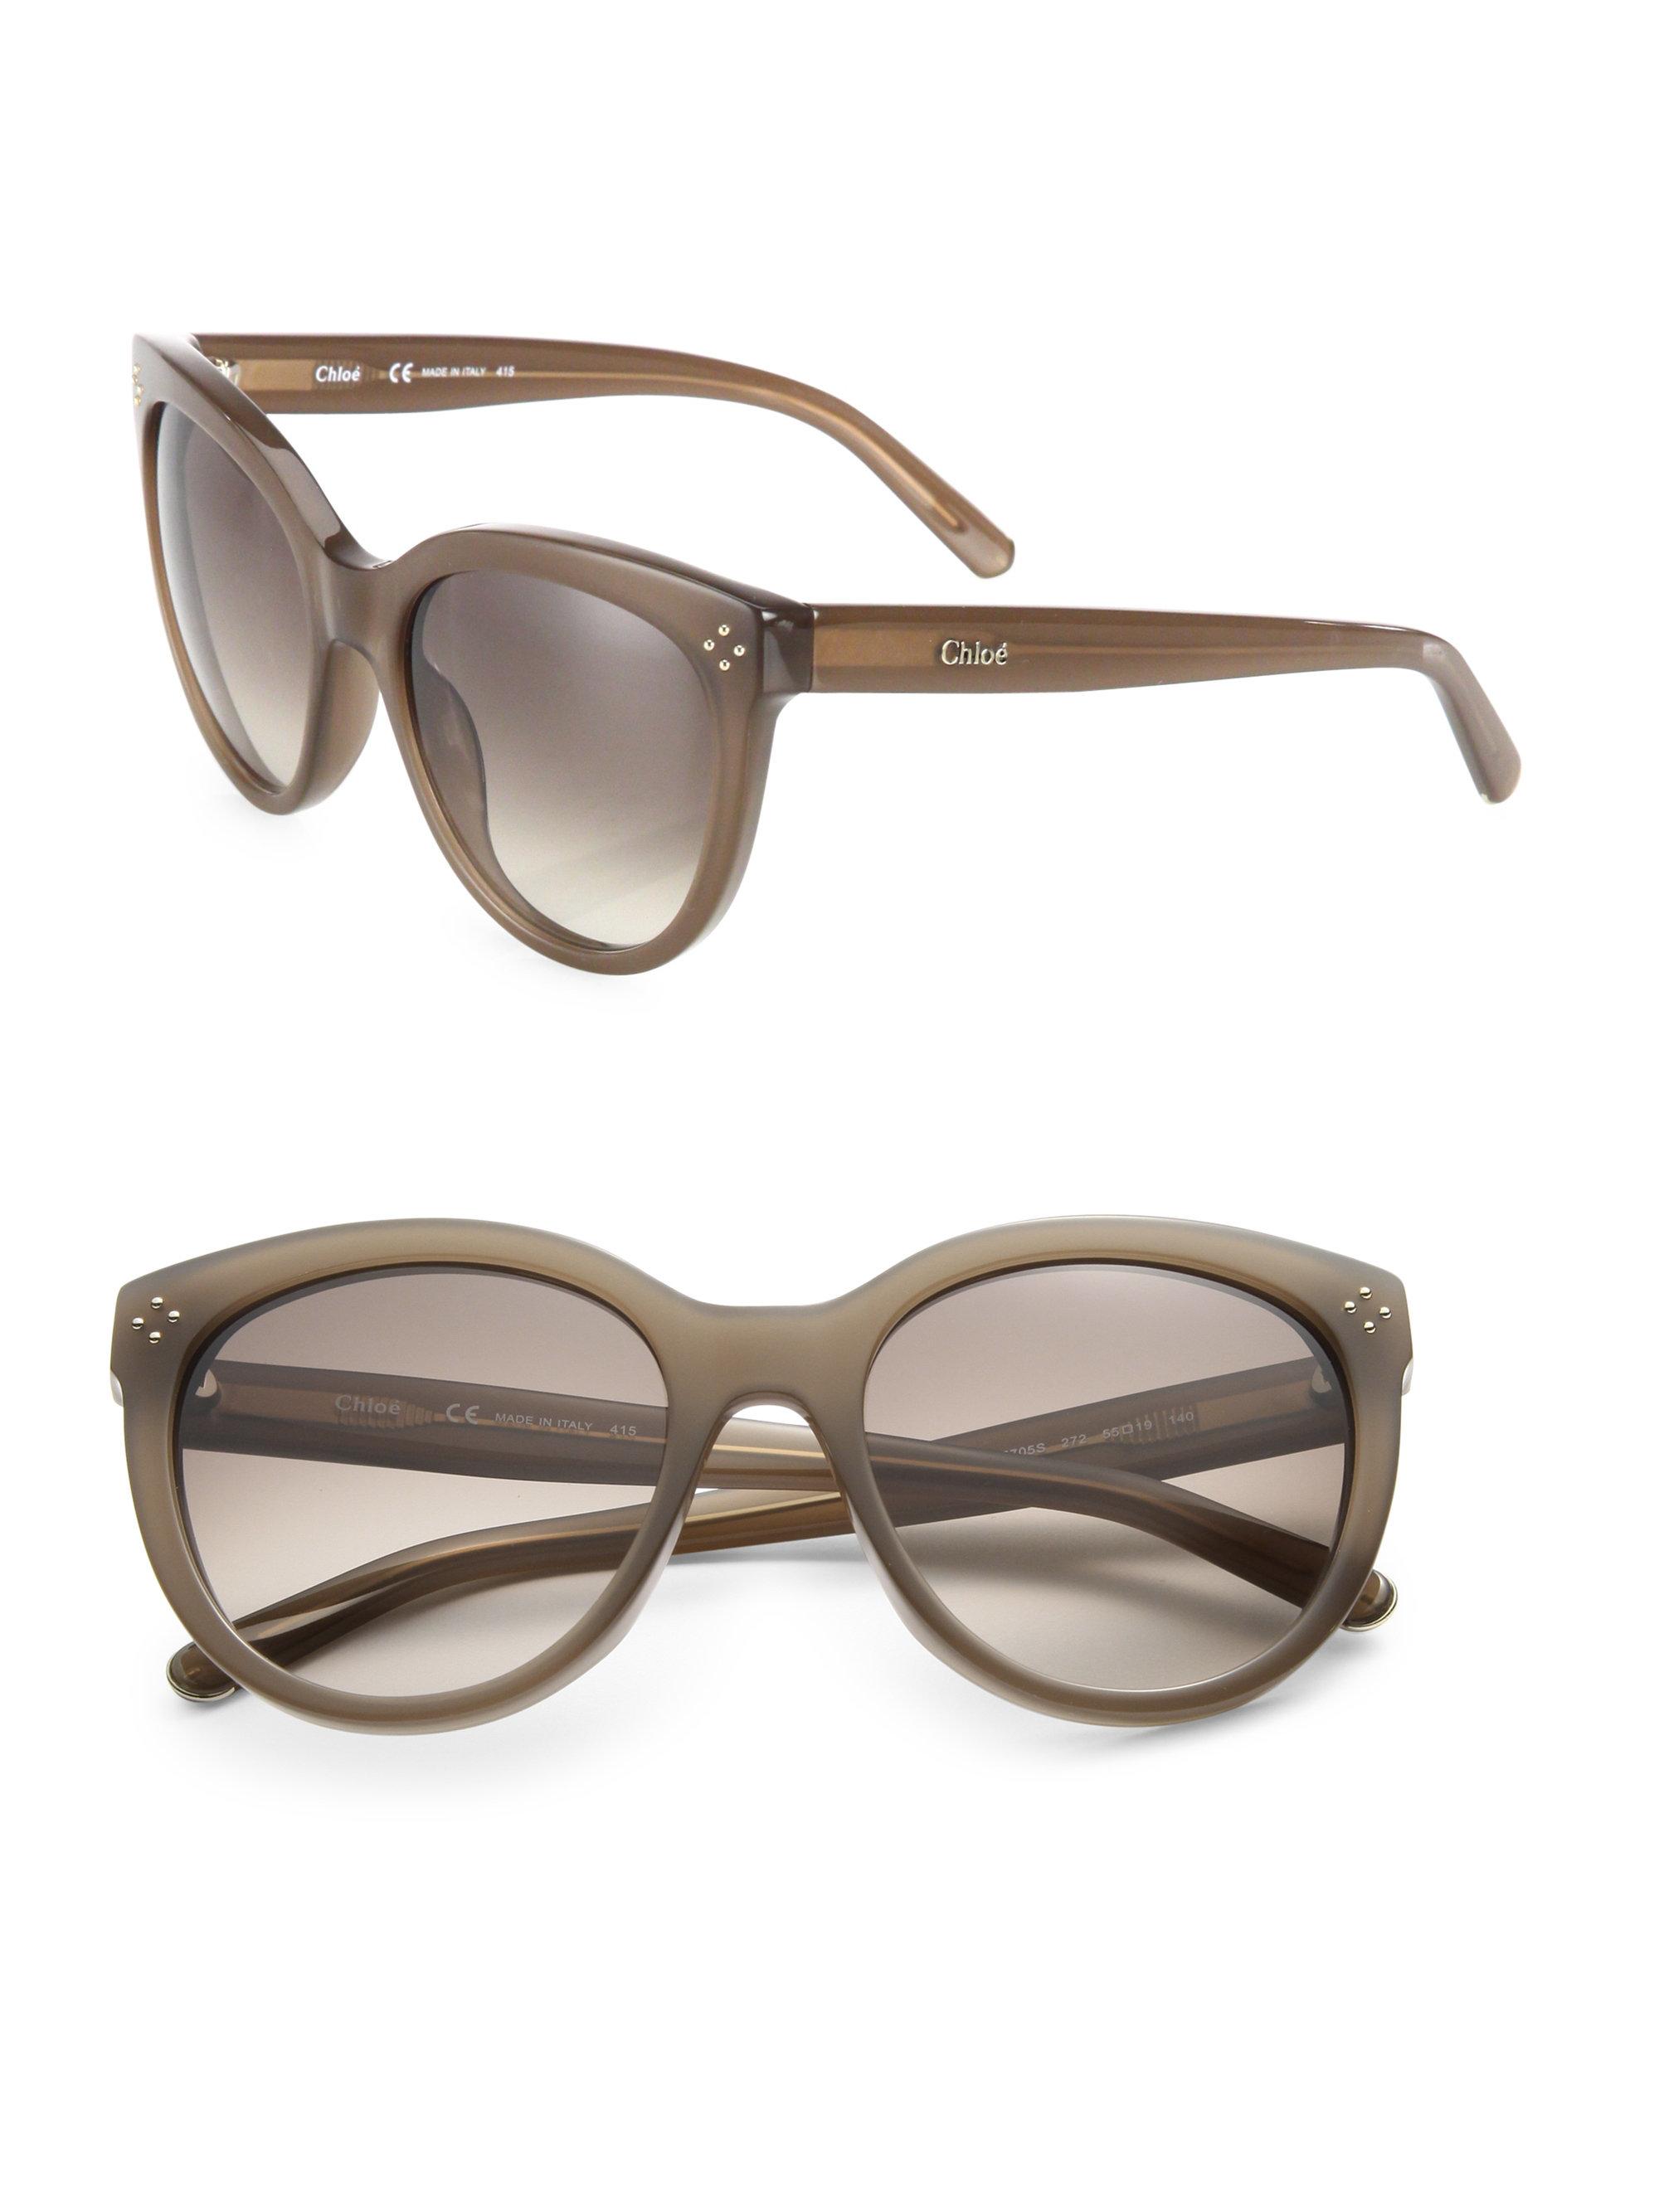 31043bf0f6b Chloe Boxwood Sunglasses Black